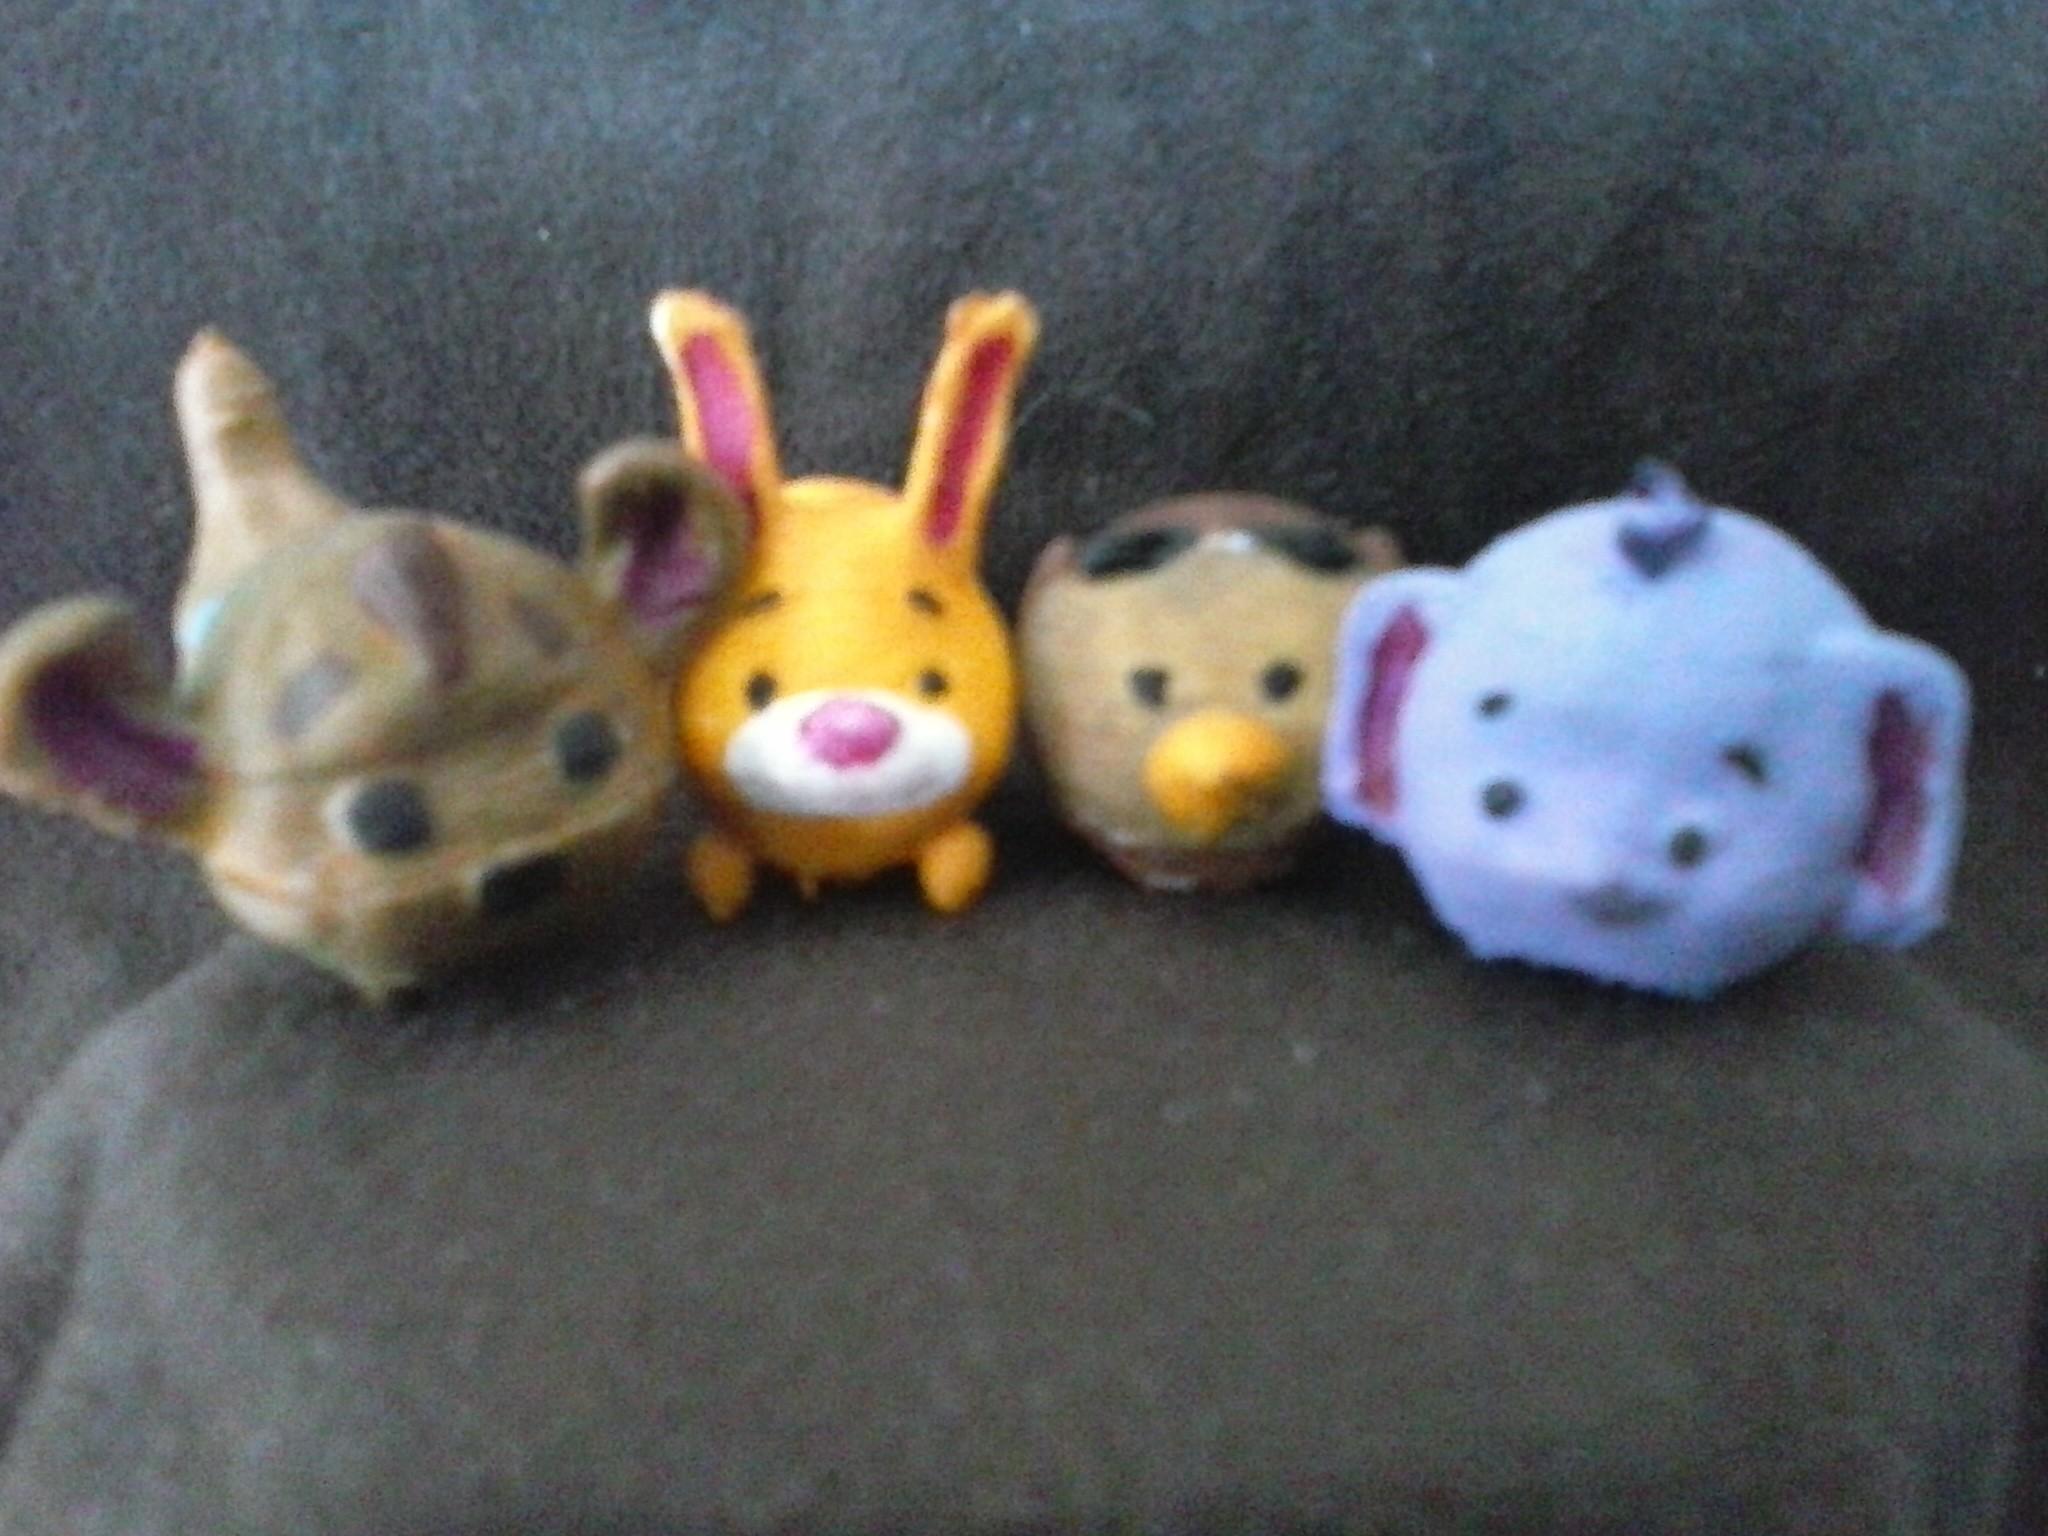 petit gourou coco lapin matre hibou lumpy.jpg Download STL file Winnie the Pooh the Pooh • 3D print model, Majin59